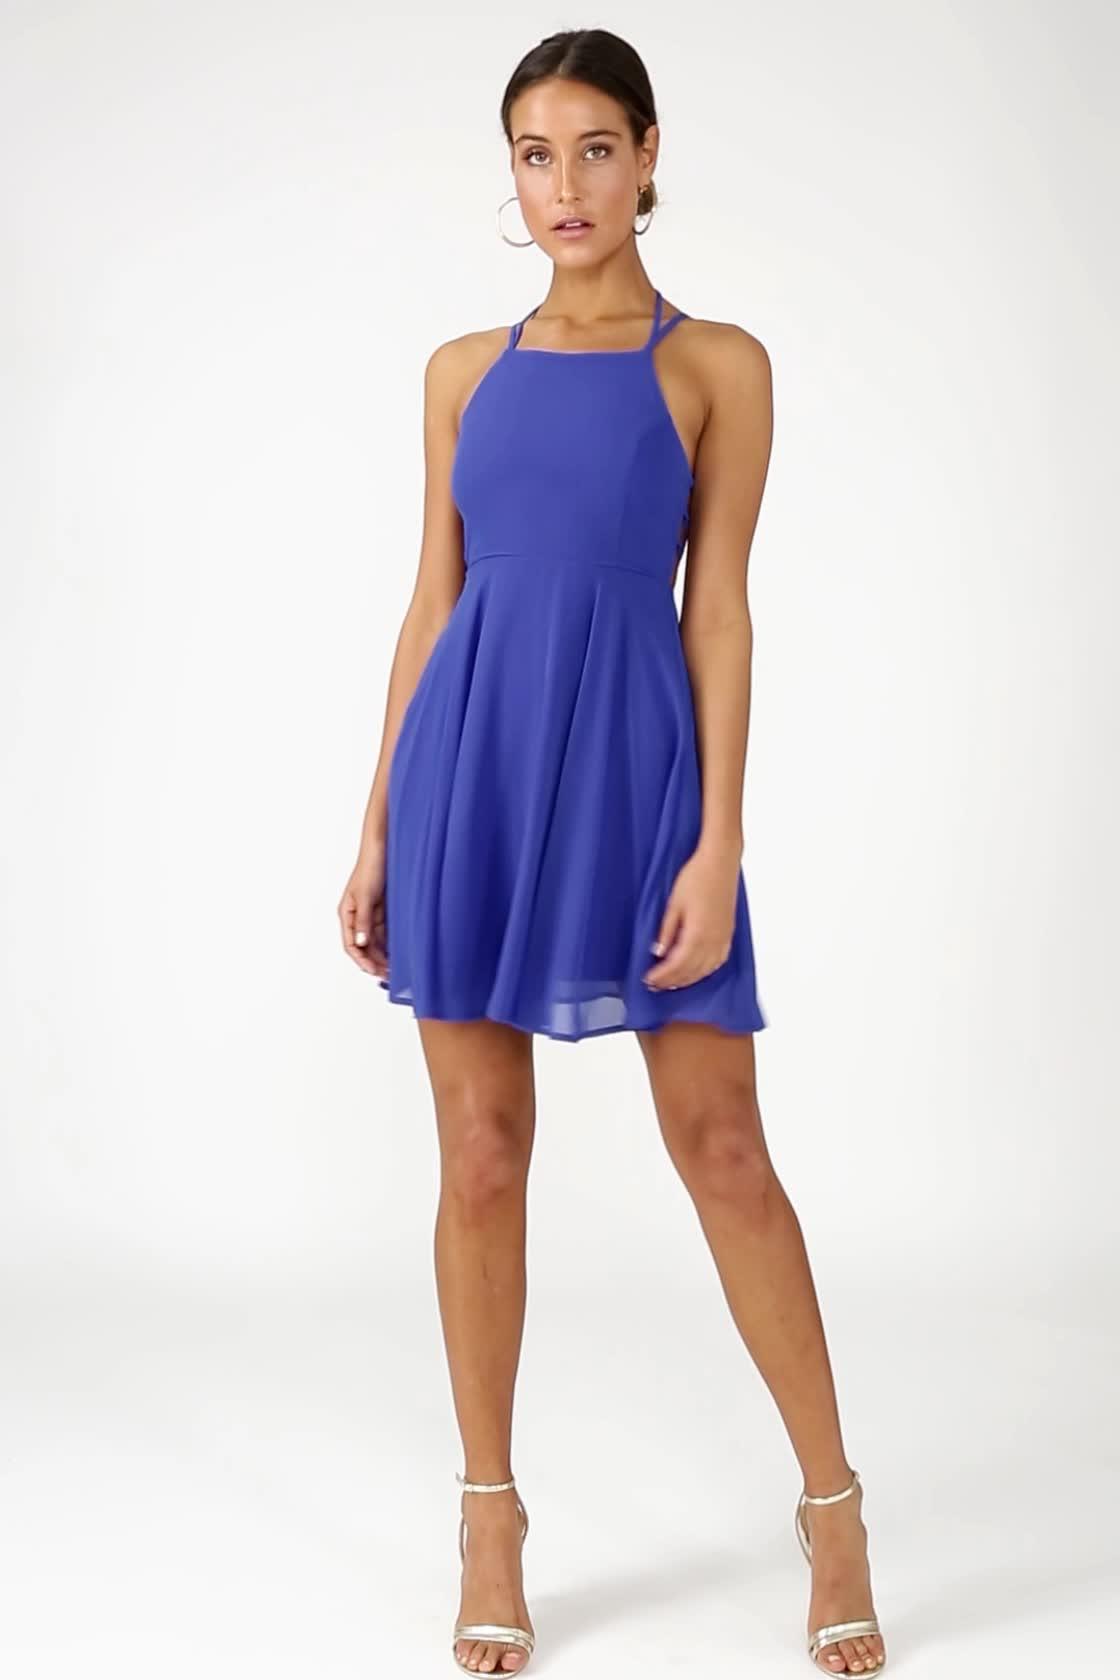 sexy royal blue dress  laceup dress  backless dress